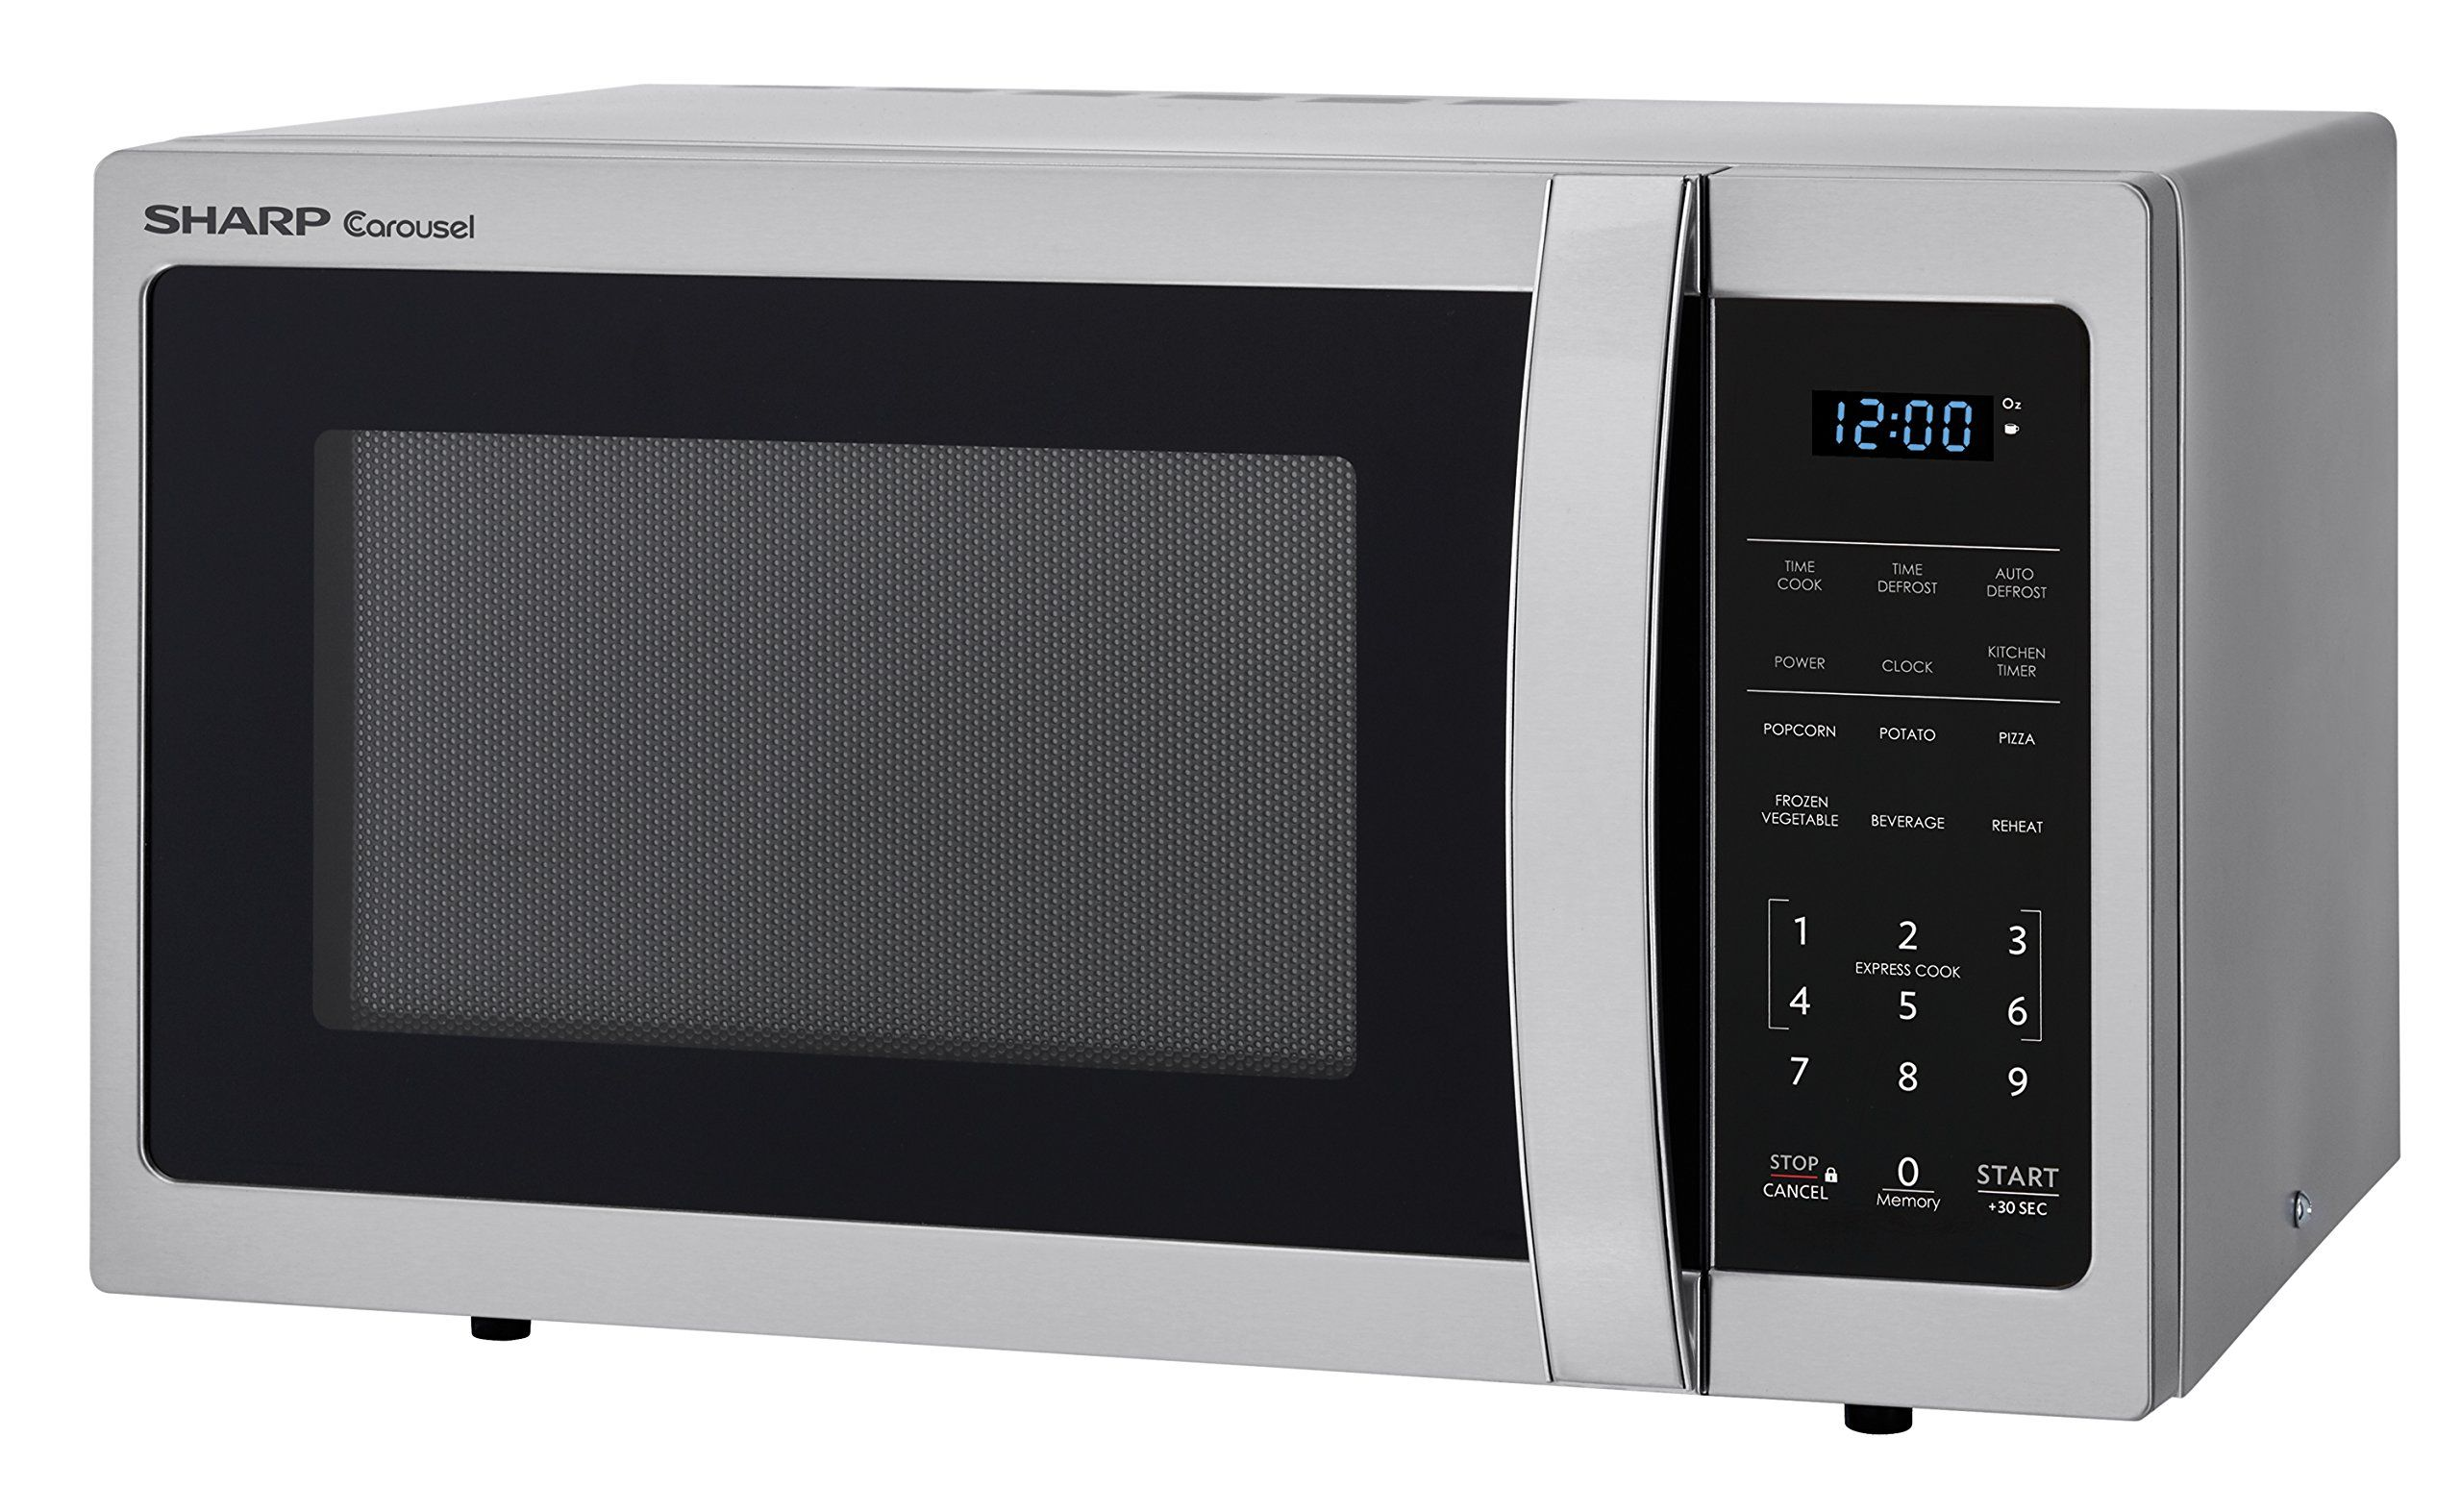 Sharp Microwaves Zsmc0912bs Sharp 900w Countertop Microwave Oven